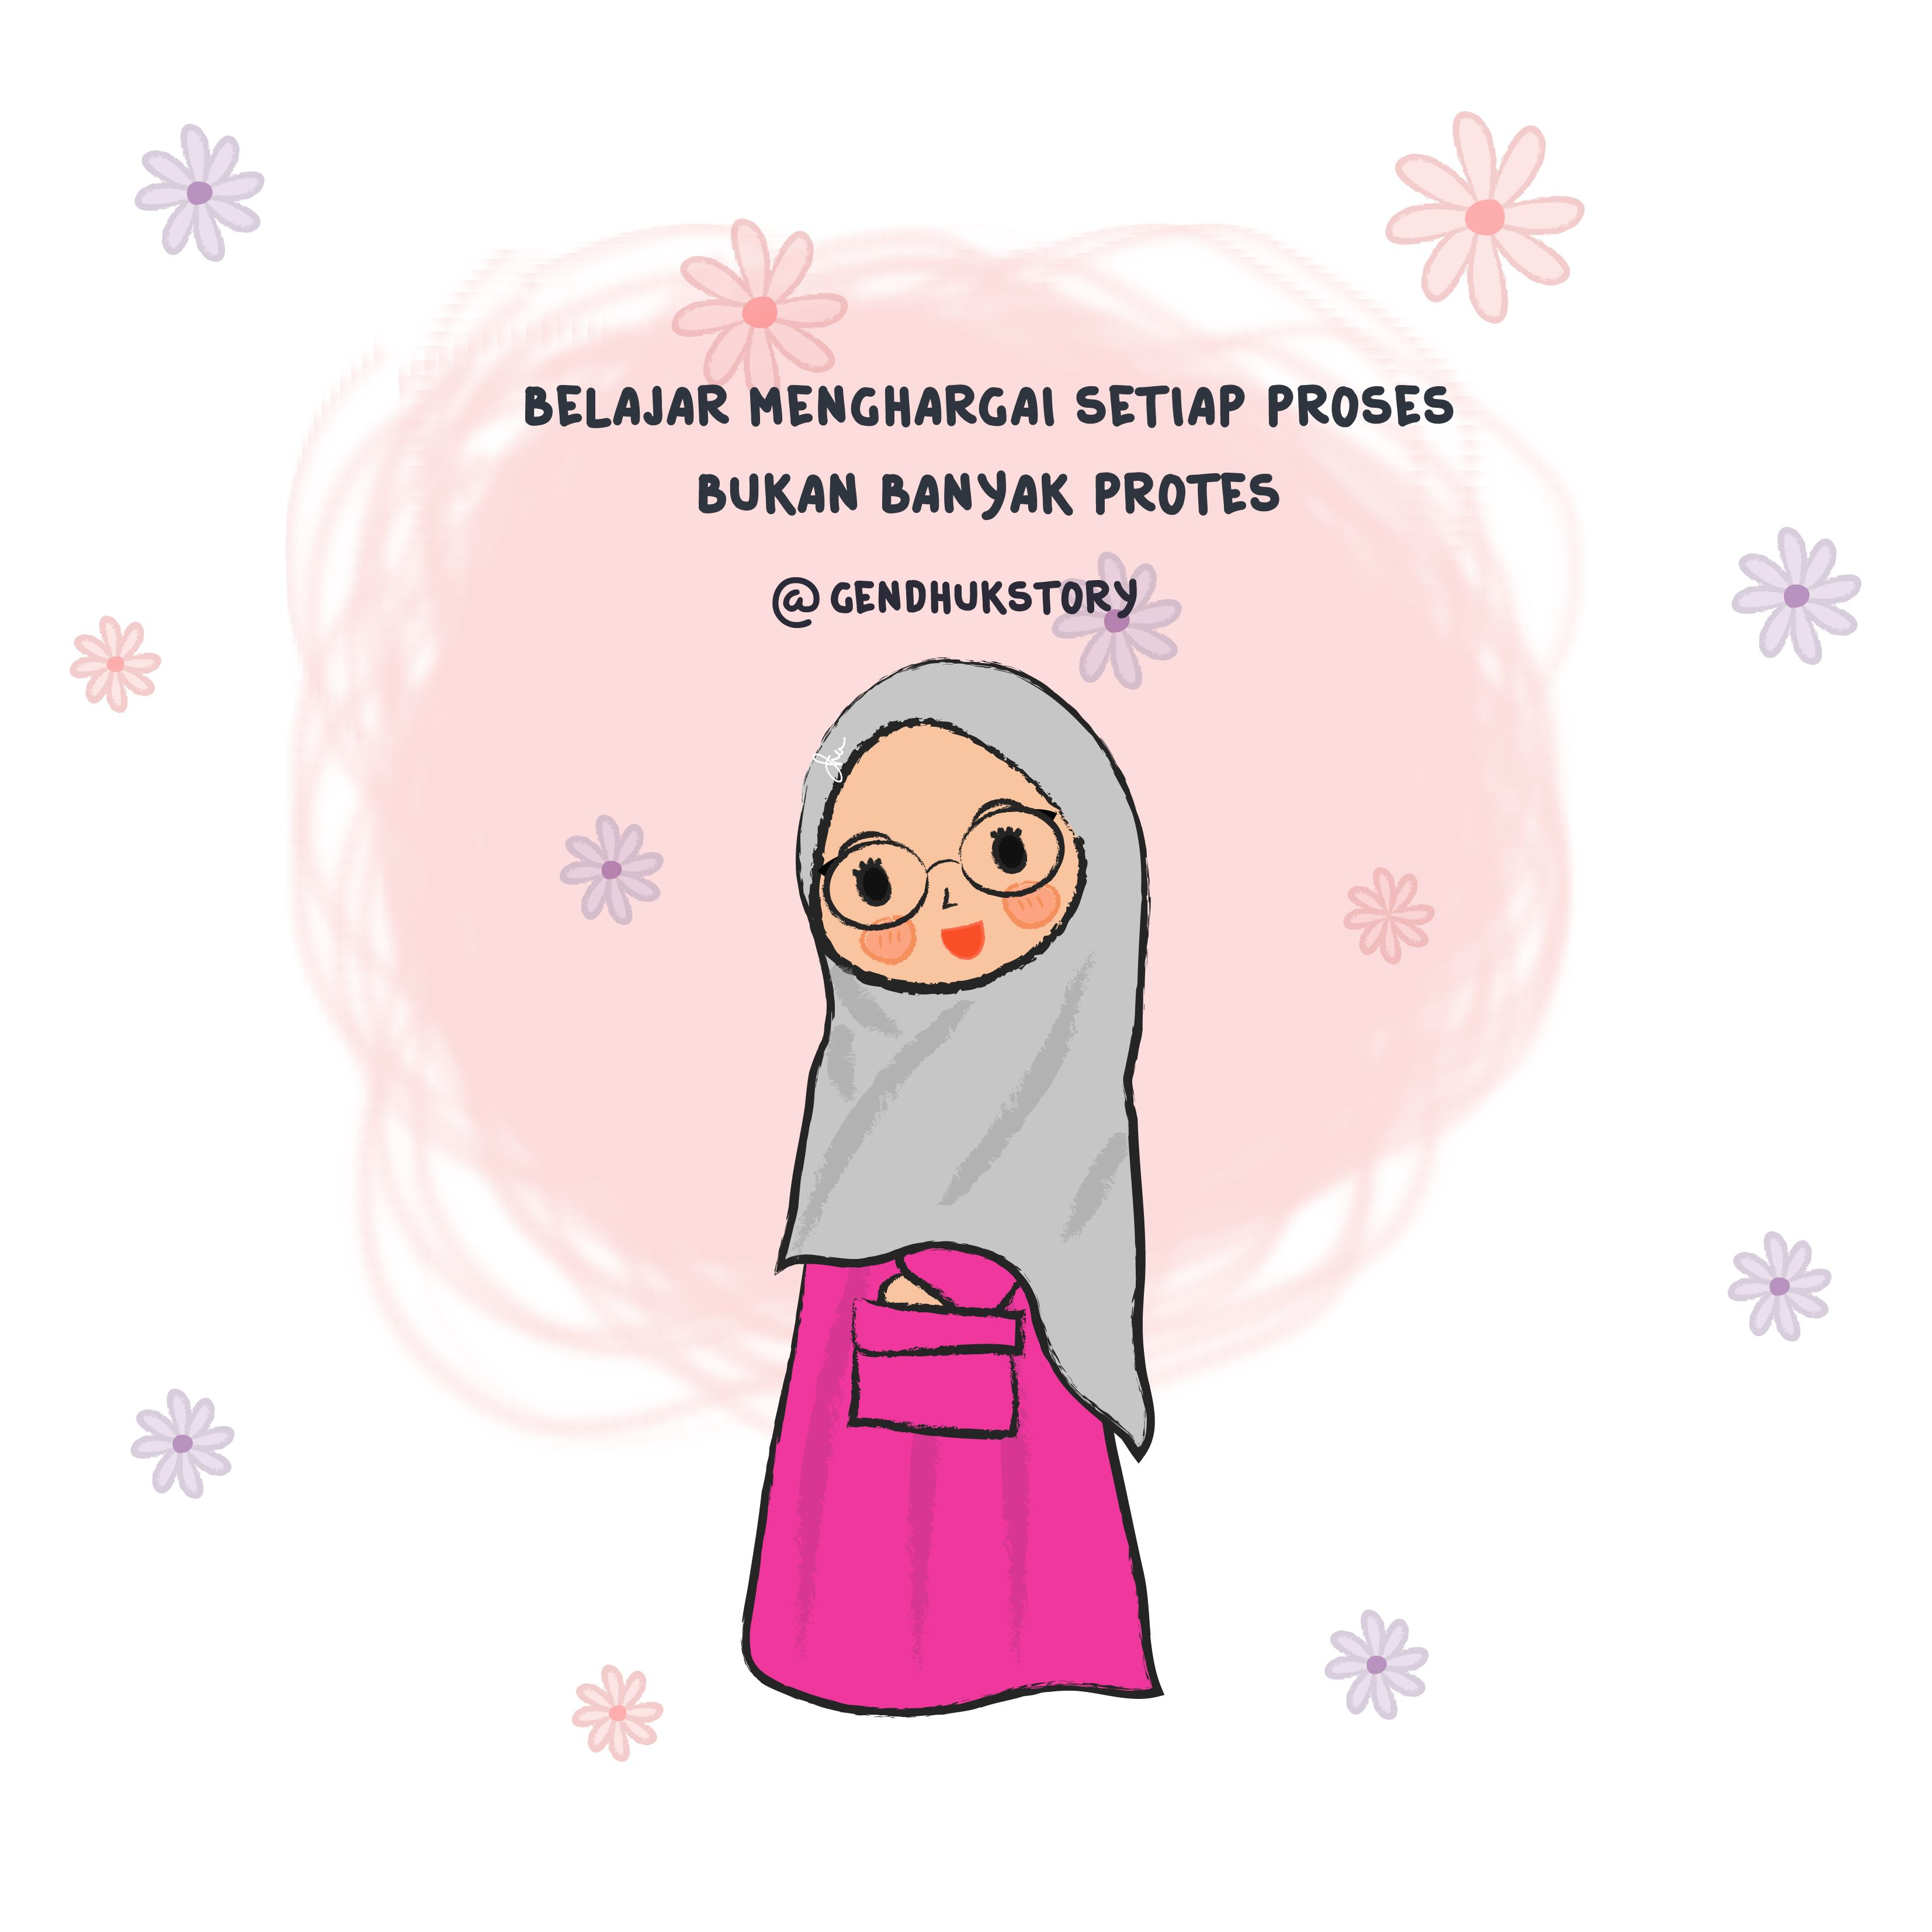 Gambar Kartun Pengantin Muslimah Bercadar